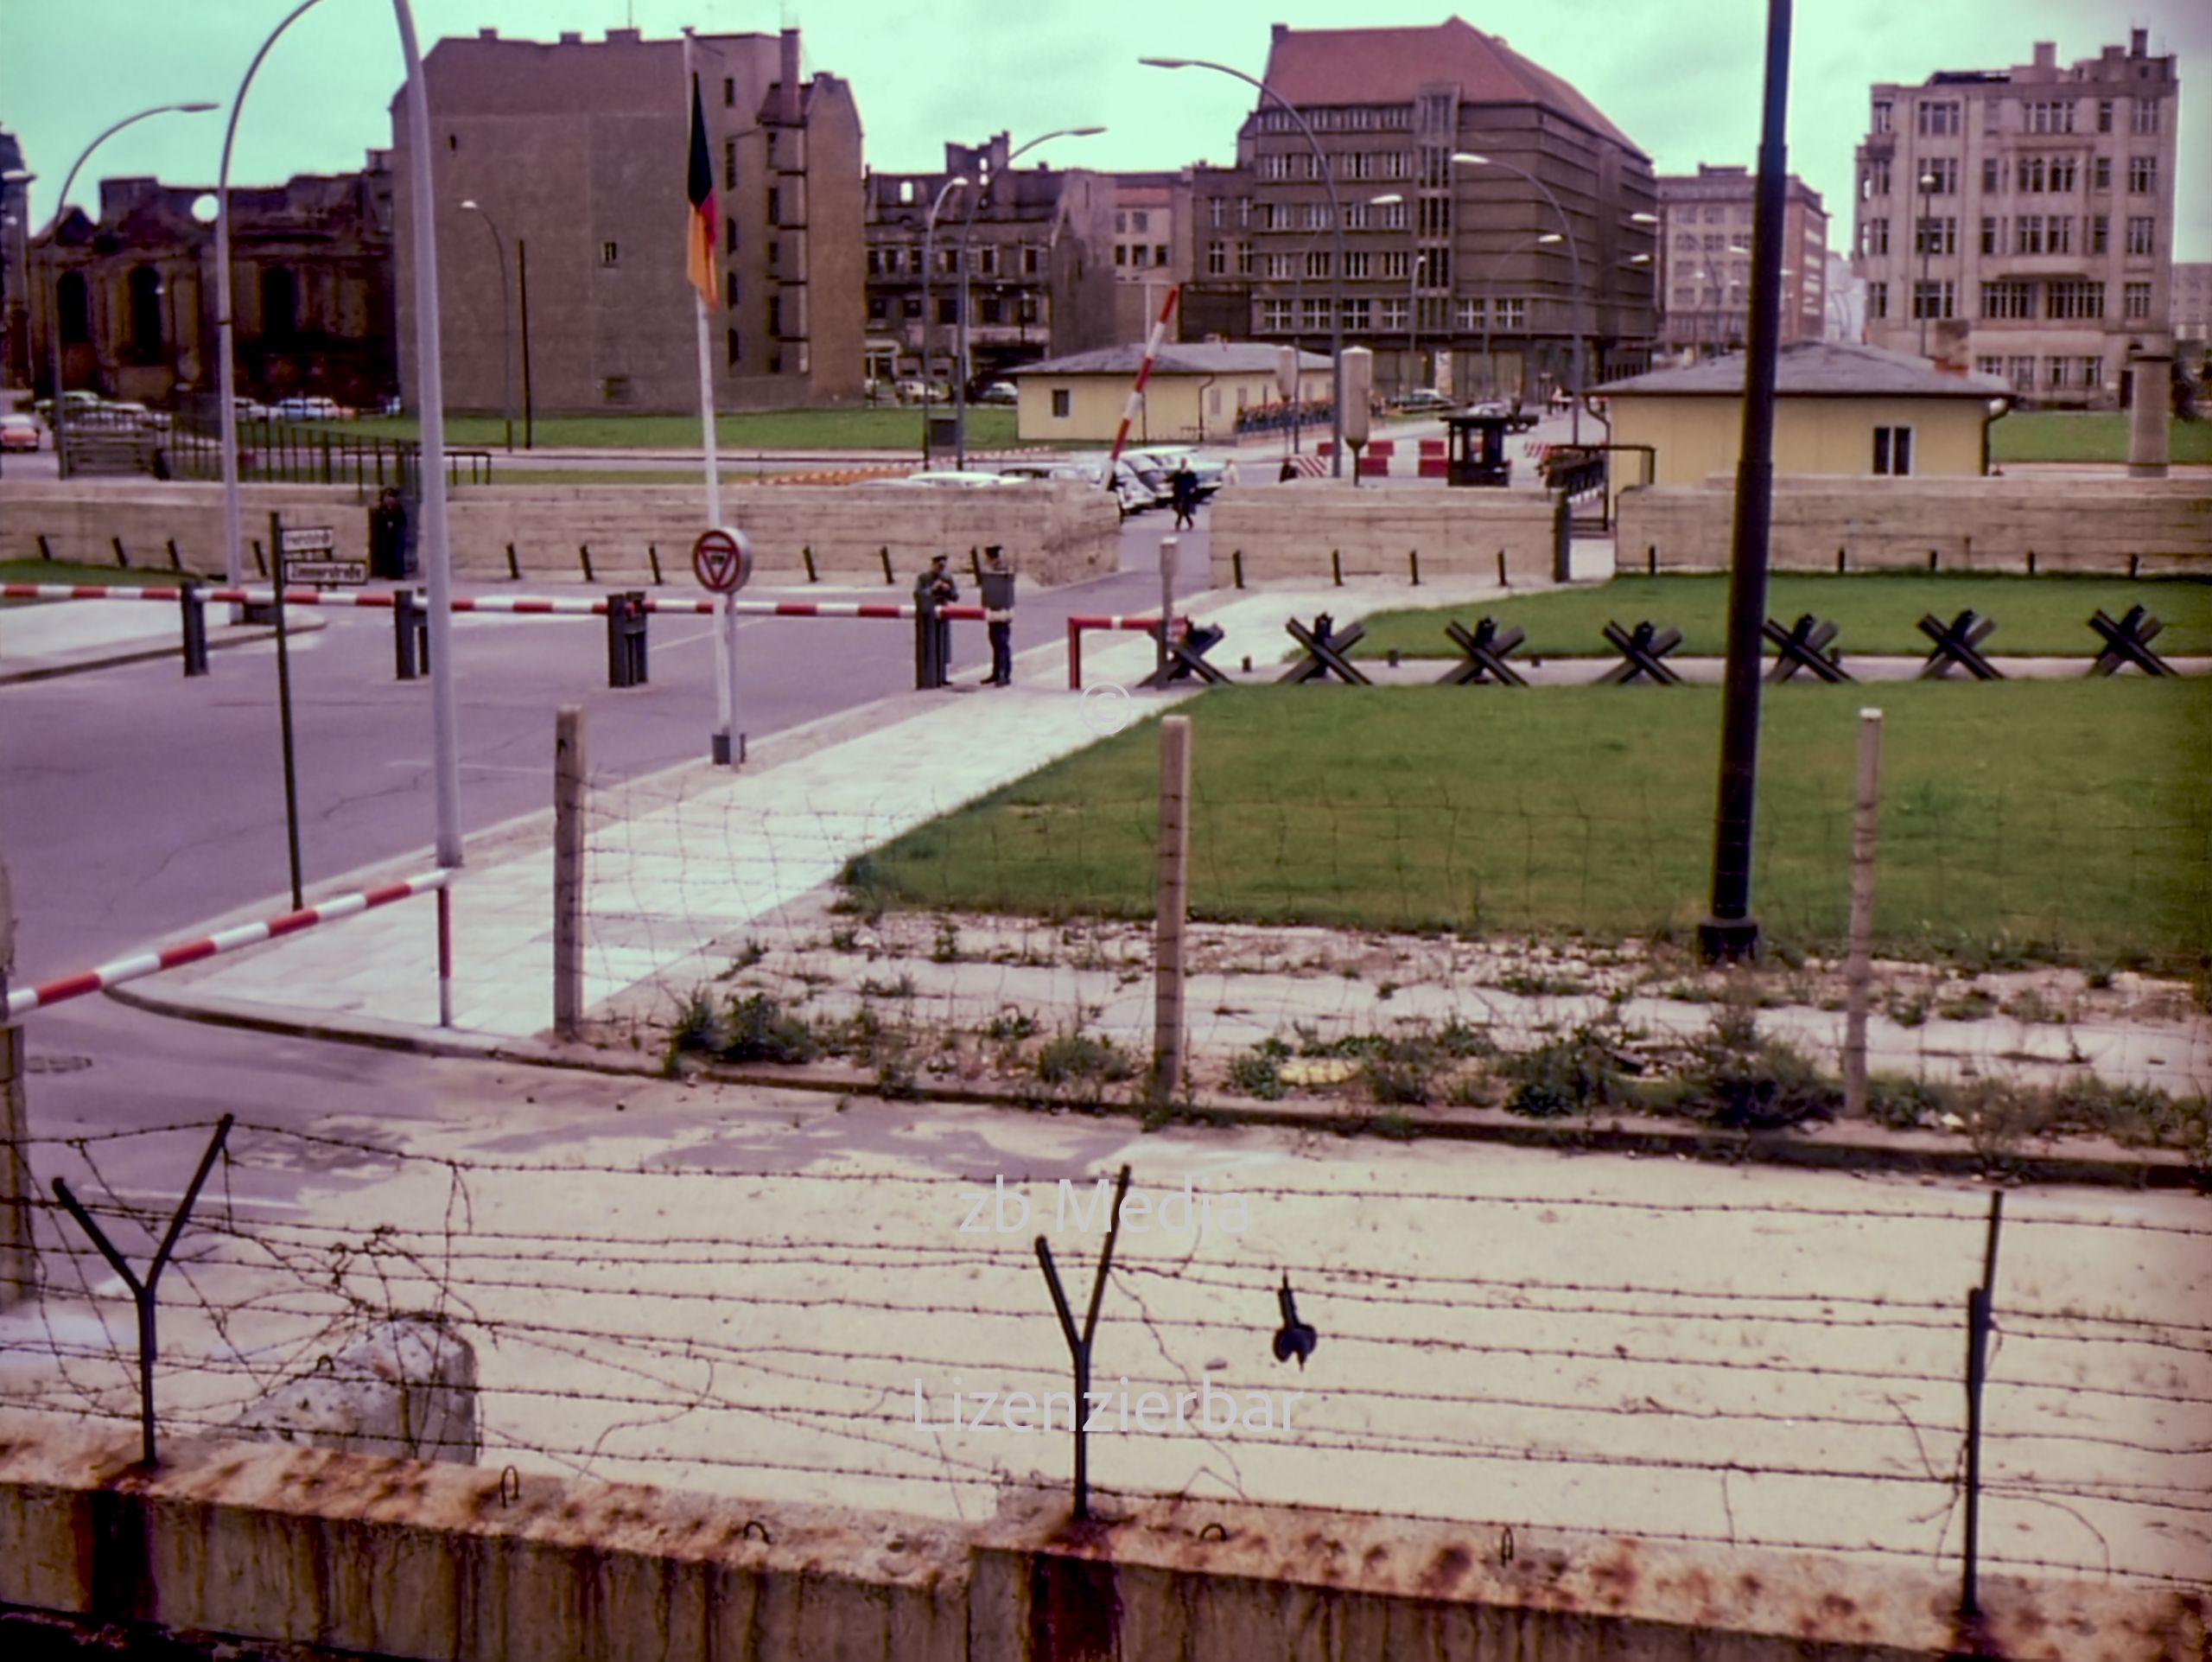 Checkpoint Charlie Berlin 1961